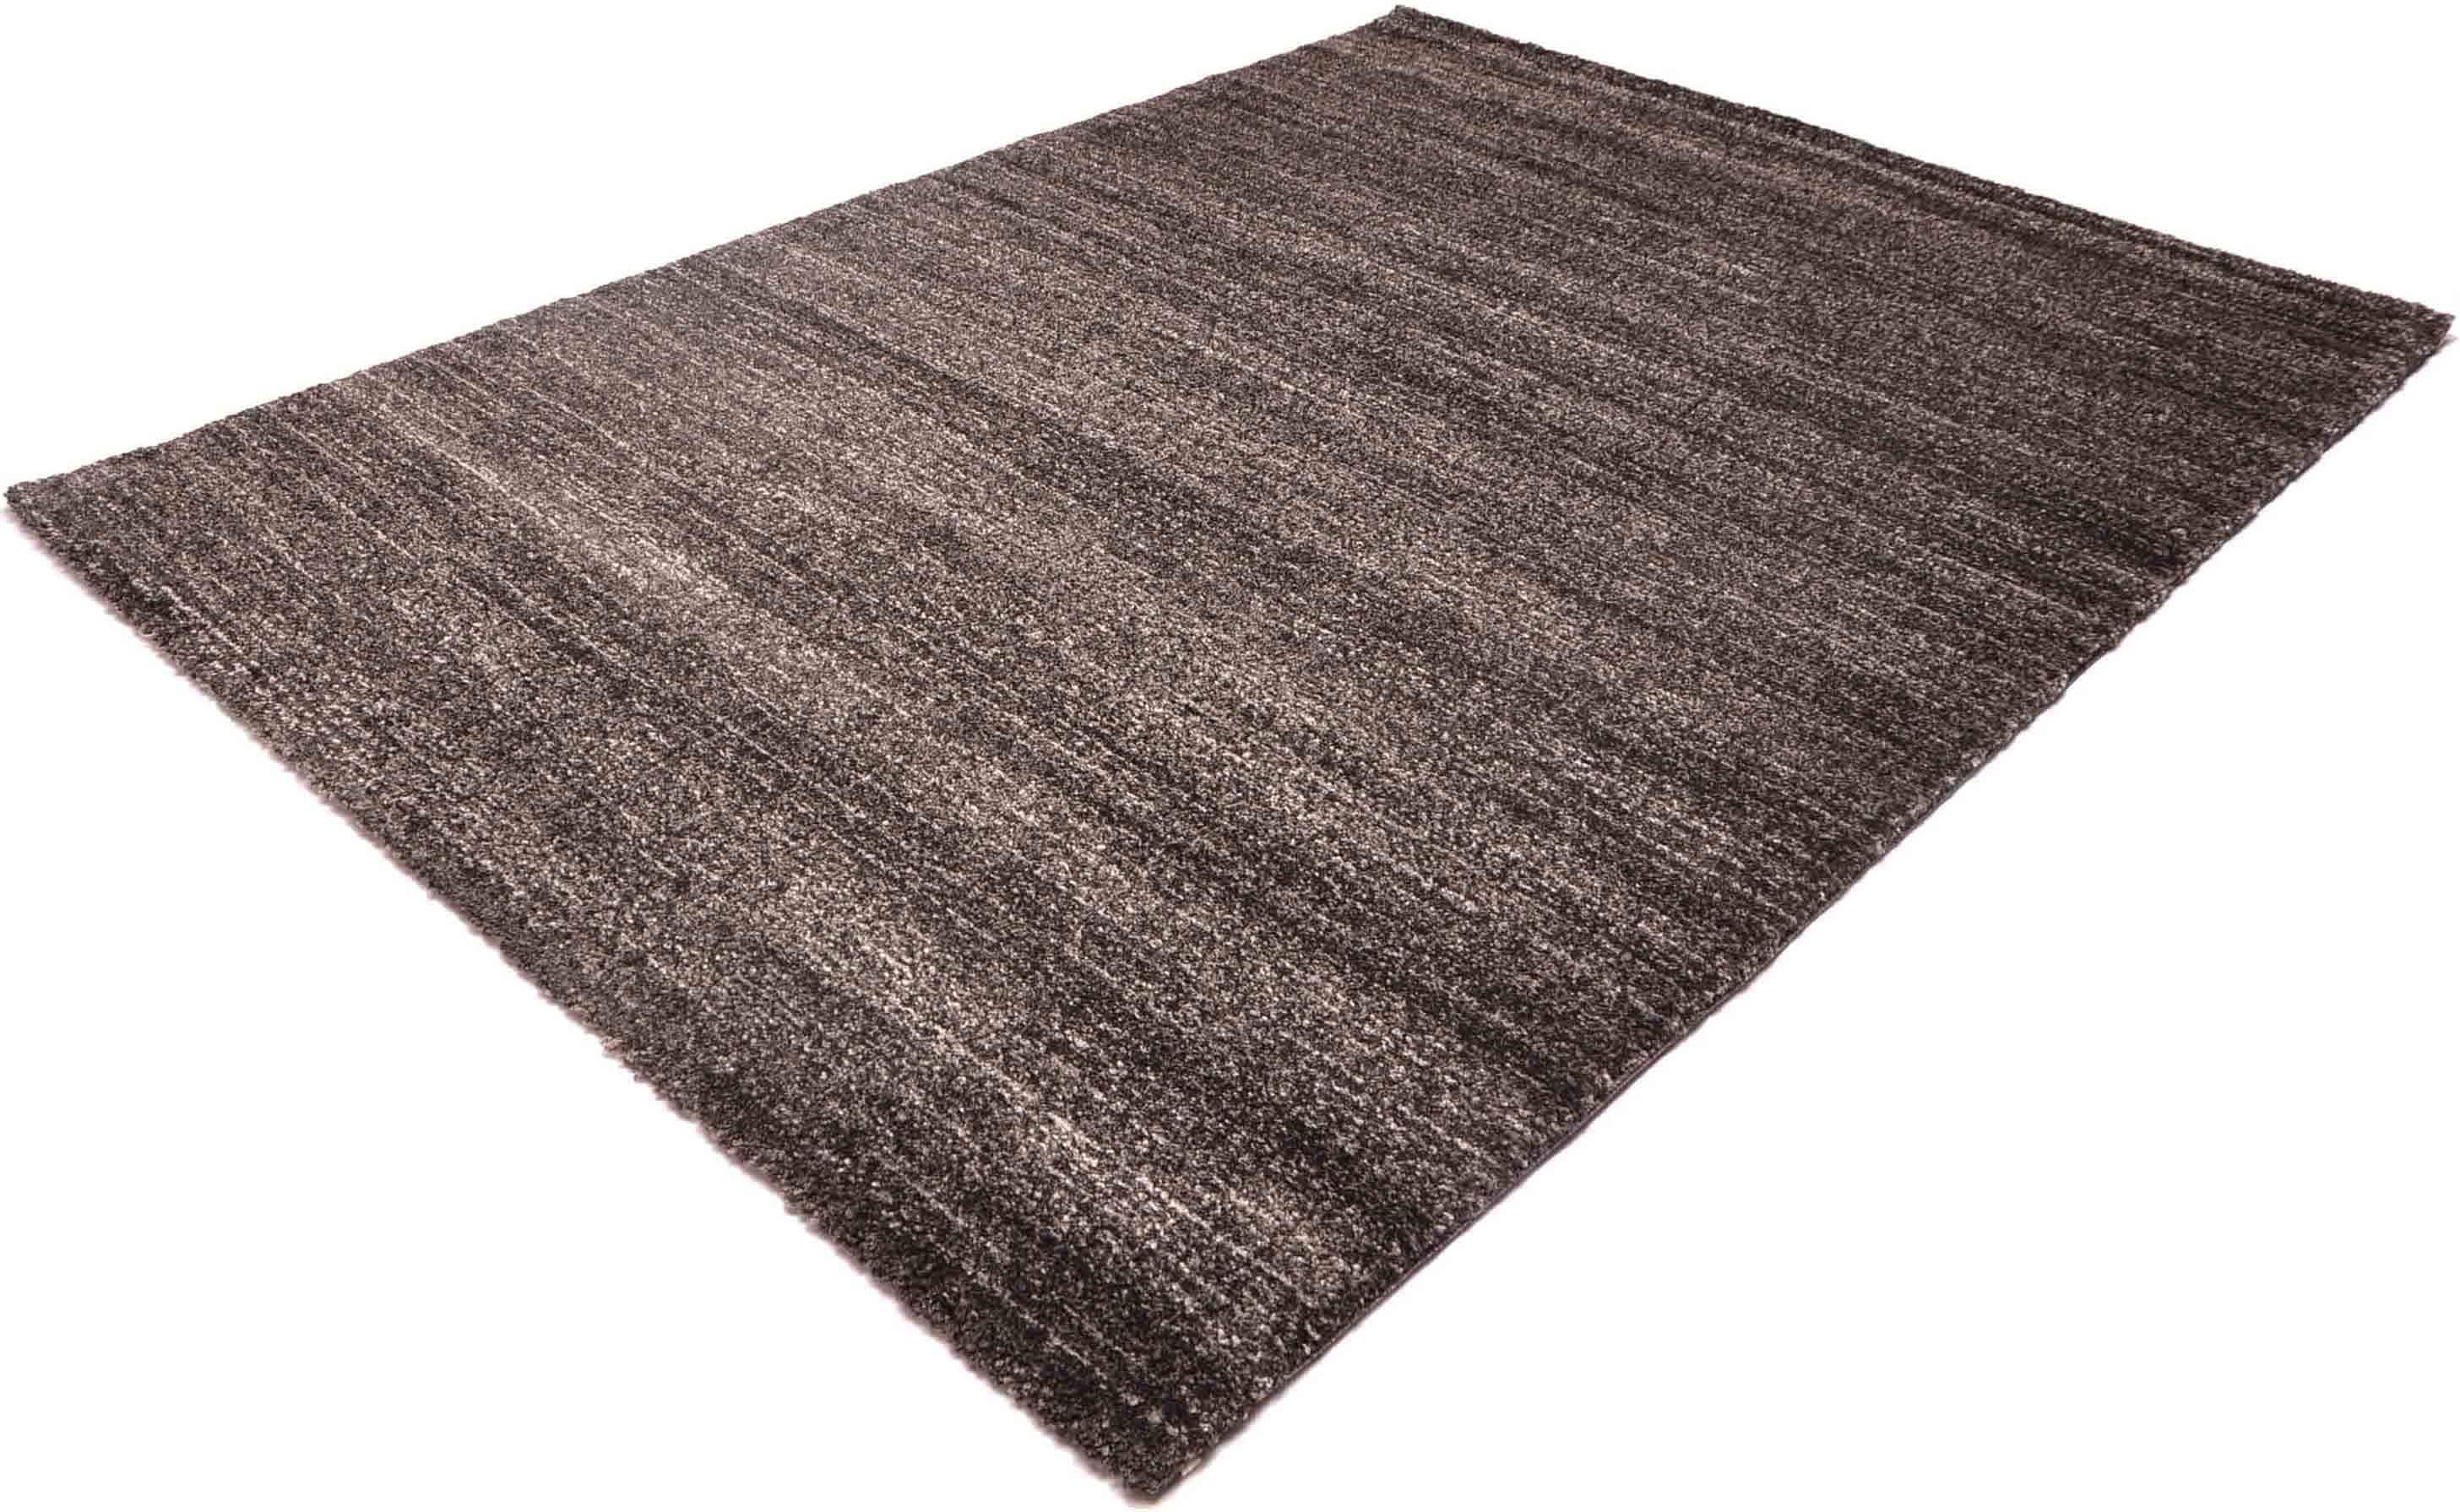 Teppich Gabeh 2010 Böing Carpet rechteckig Höhe 20 mm maschinell zusammengesetzt